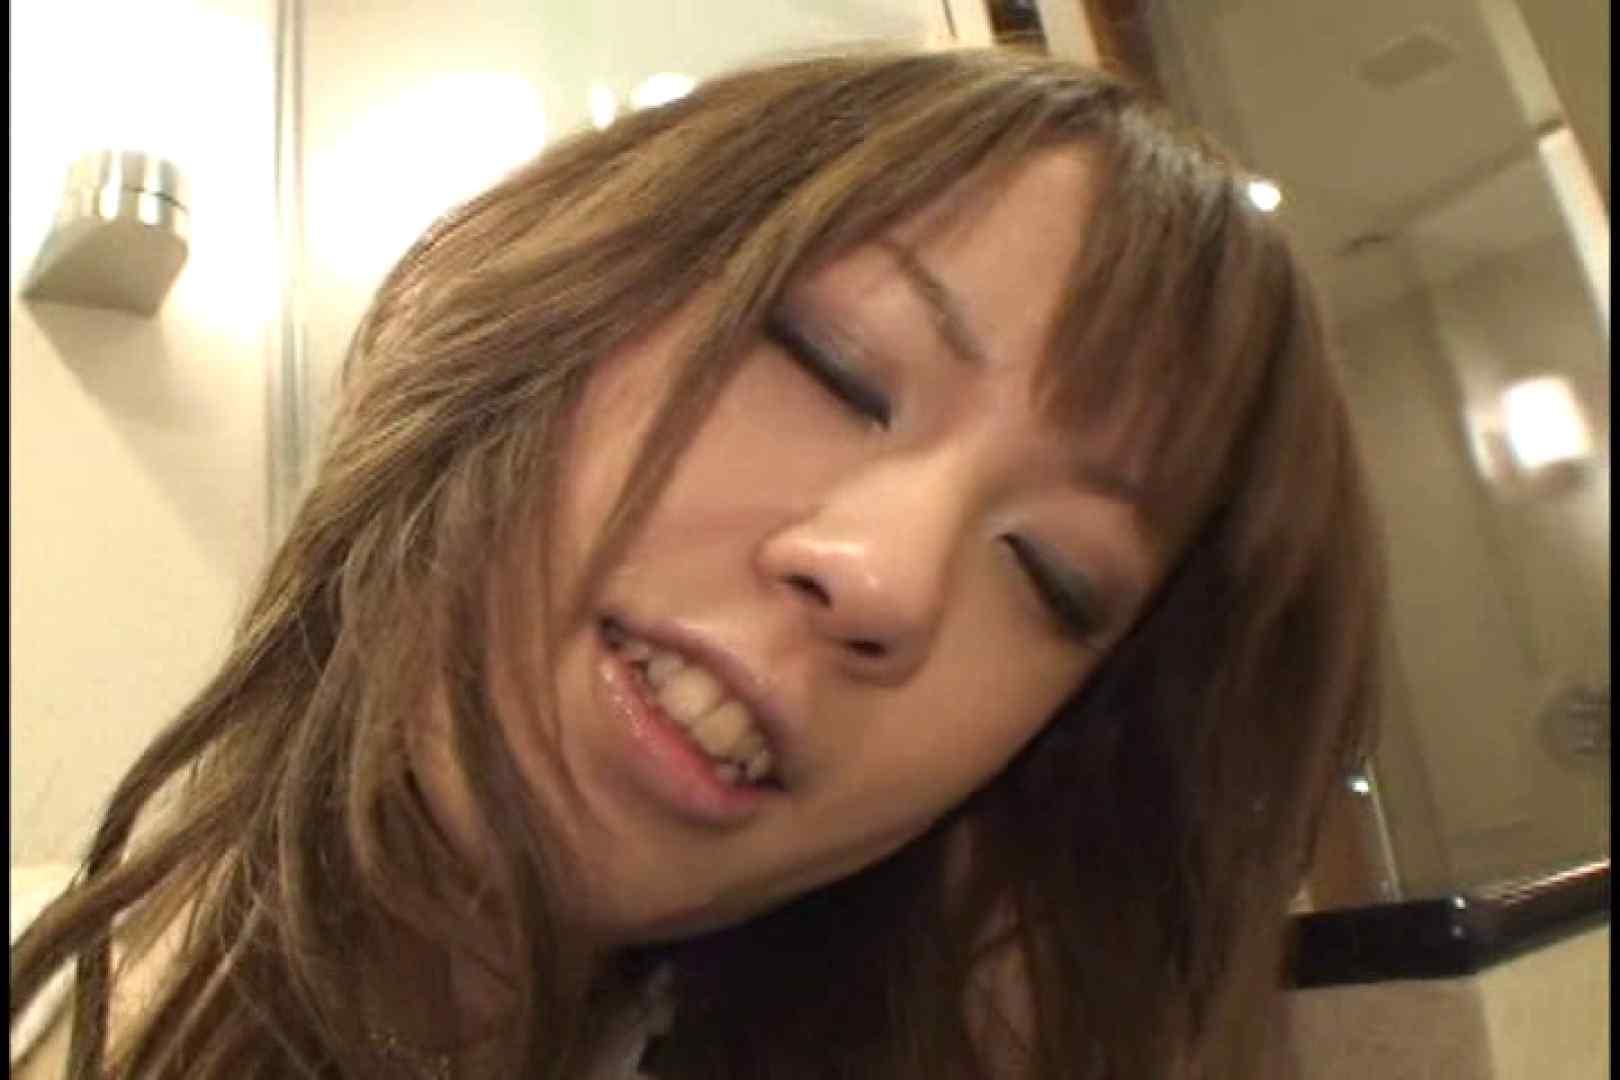 JDハンター全国ツアー vol.017 後編 女子大生のエロ動画  82PIX 24